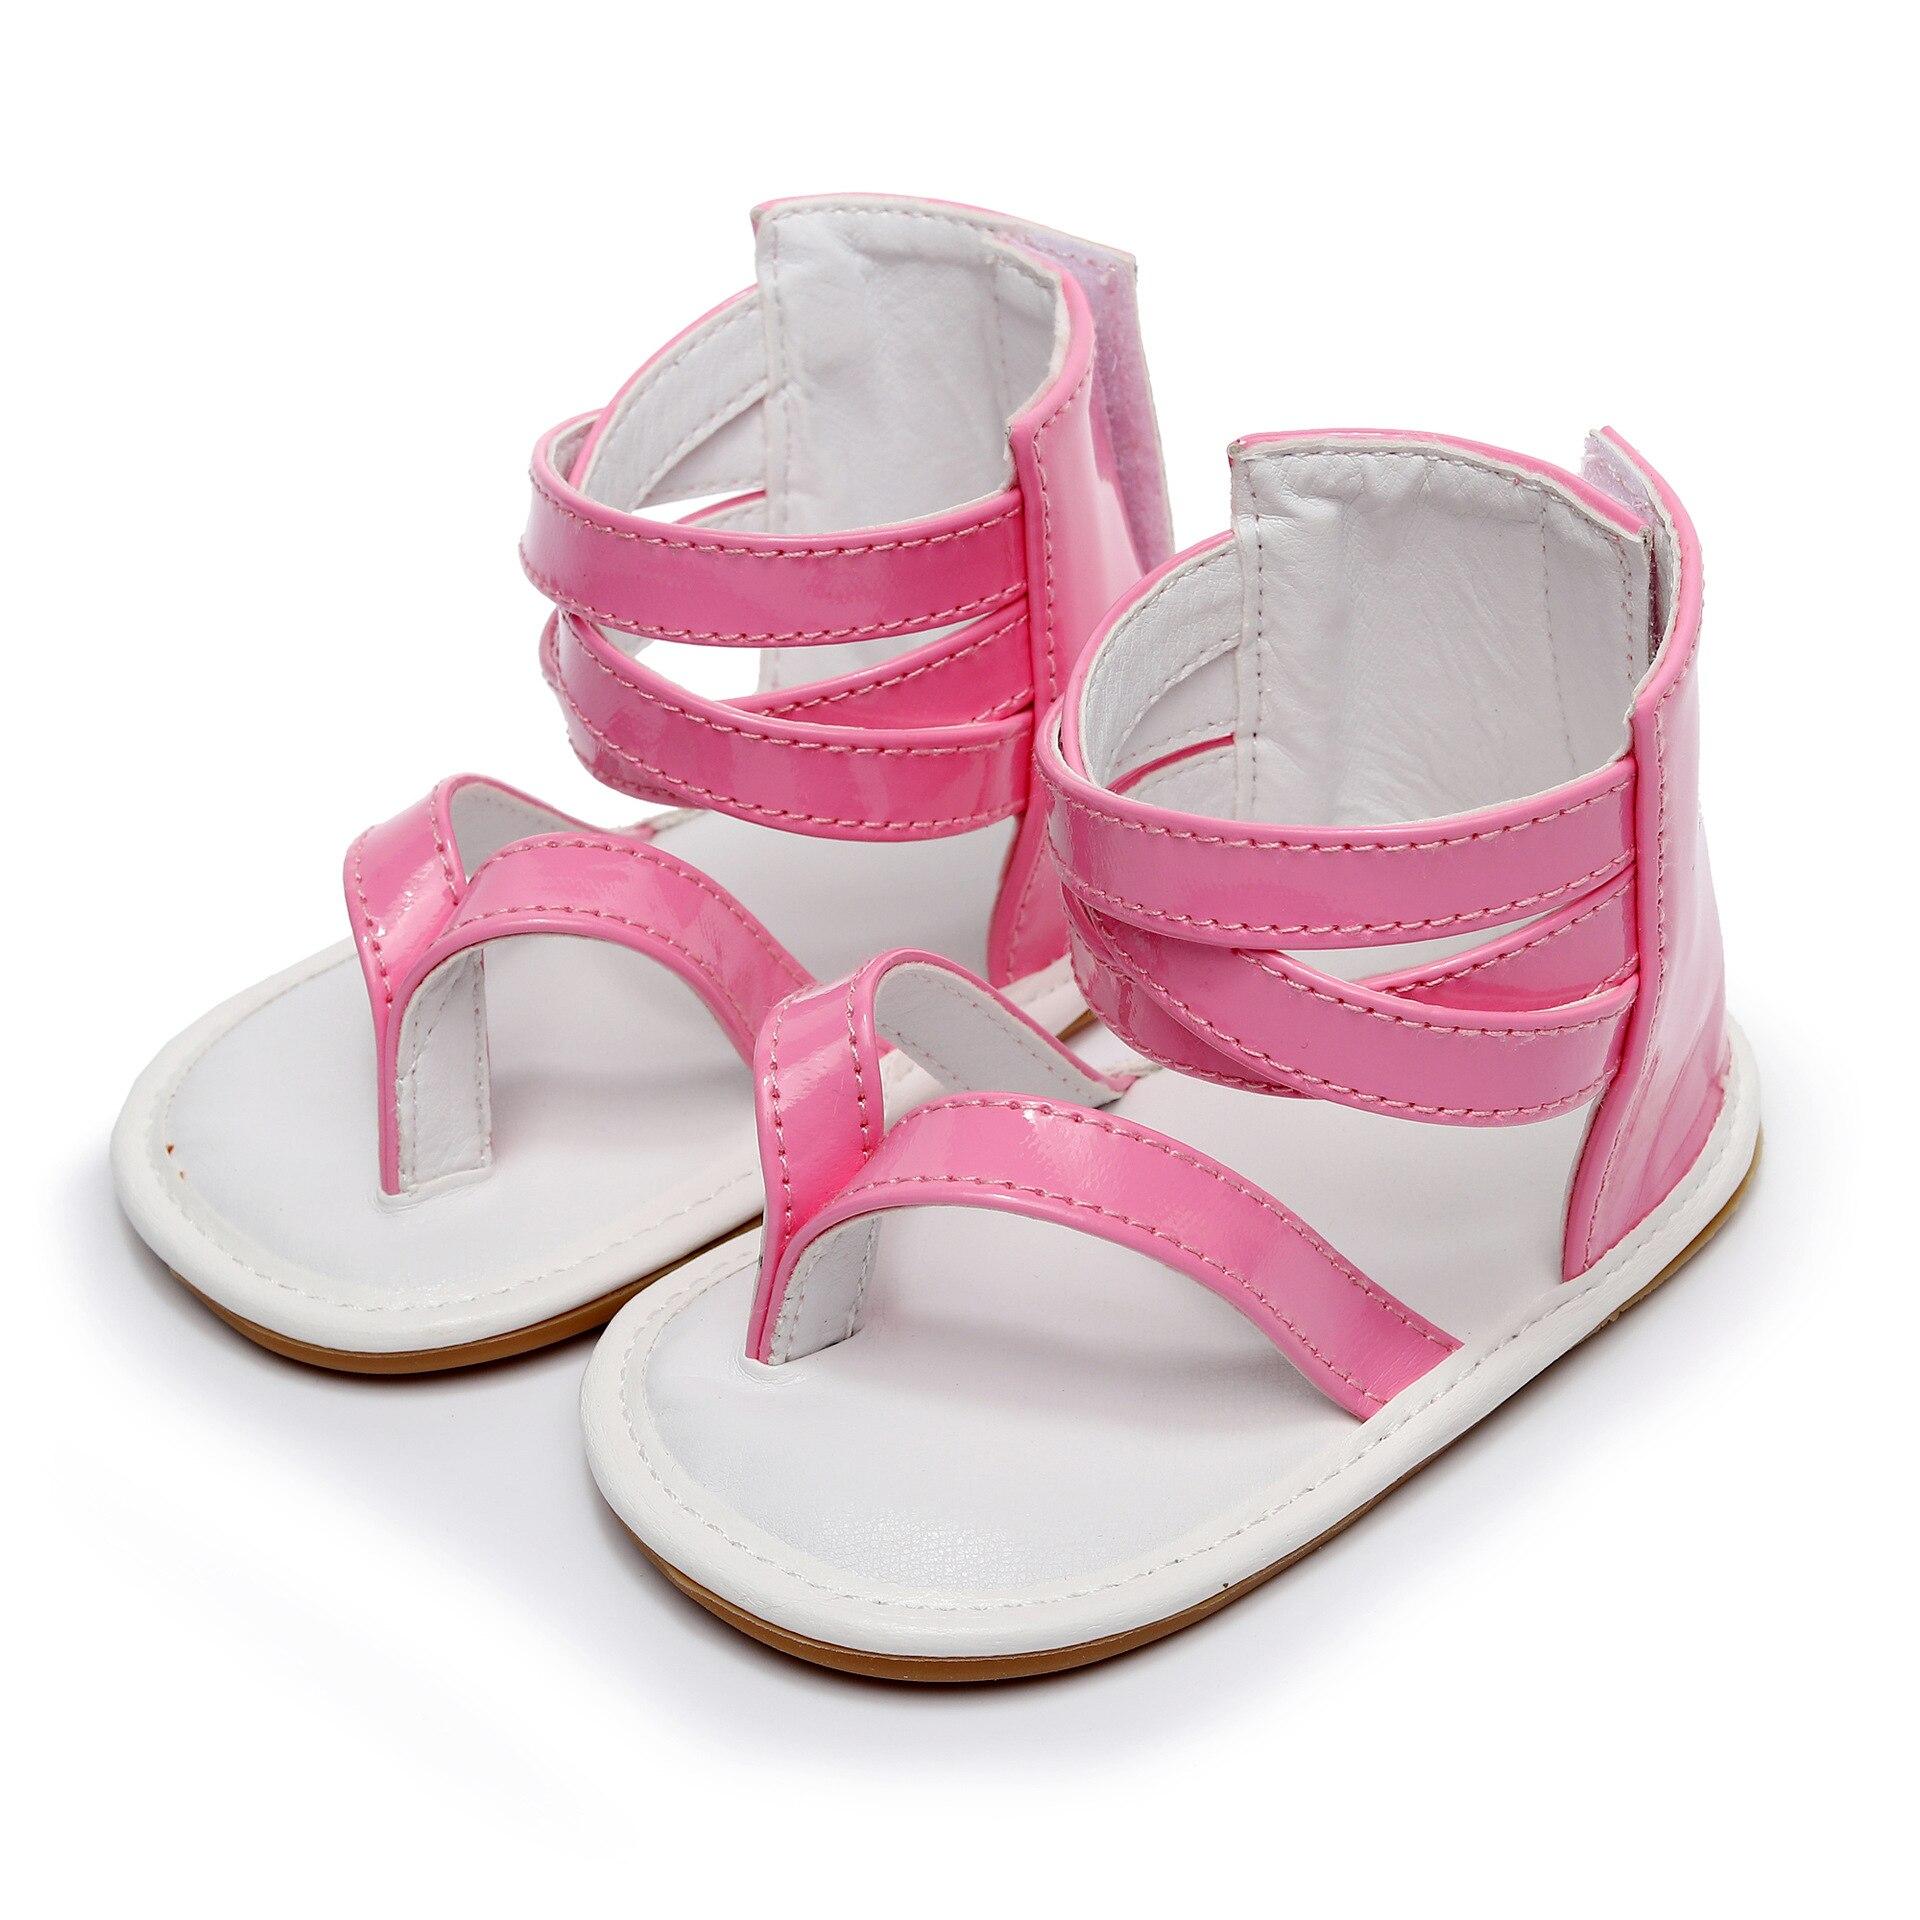 2018 Summer New Baby Girls Sandals